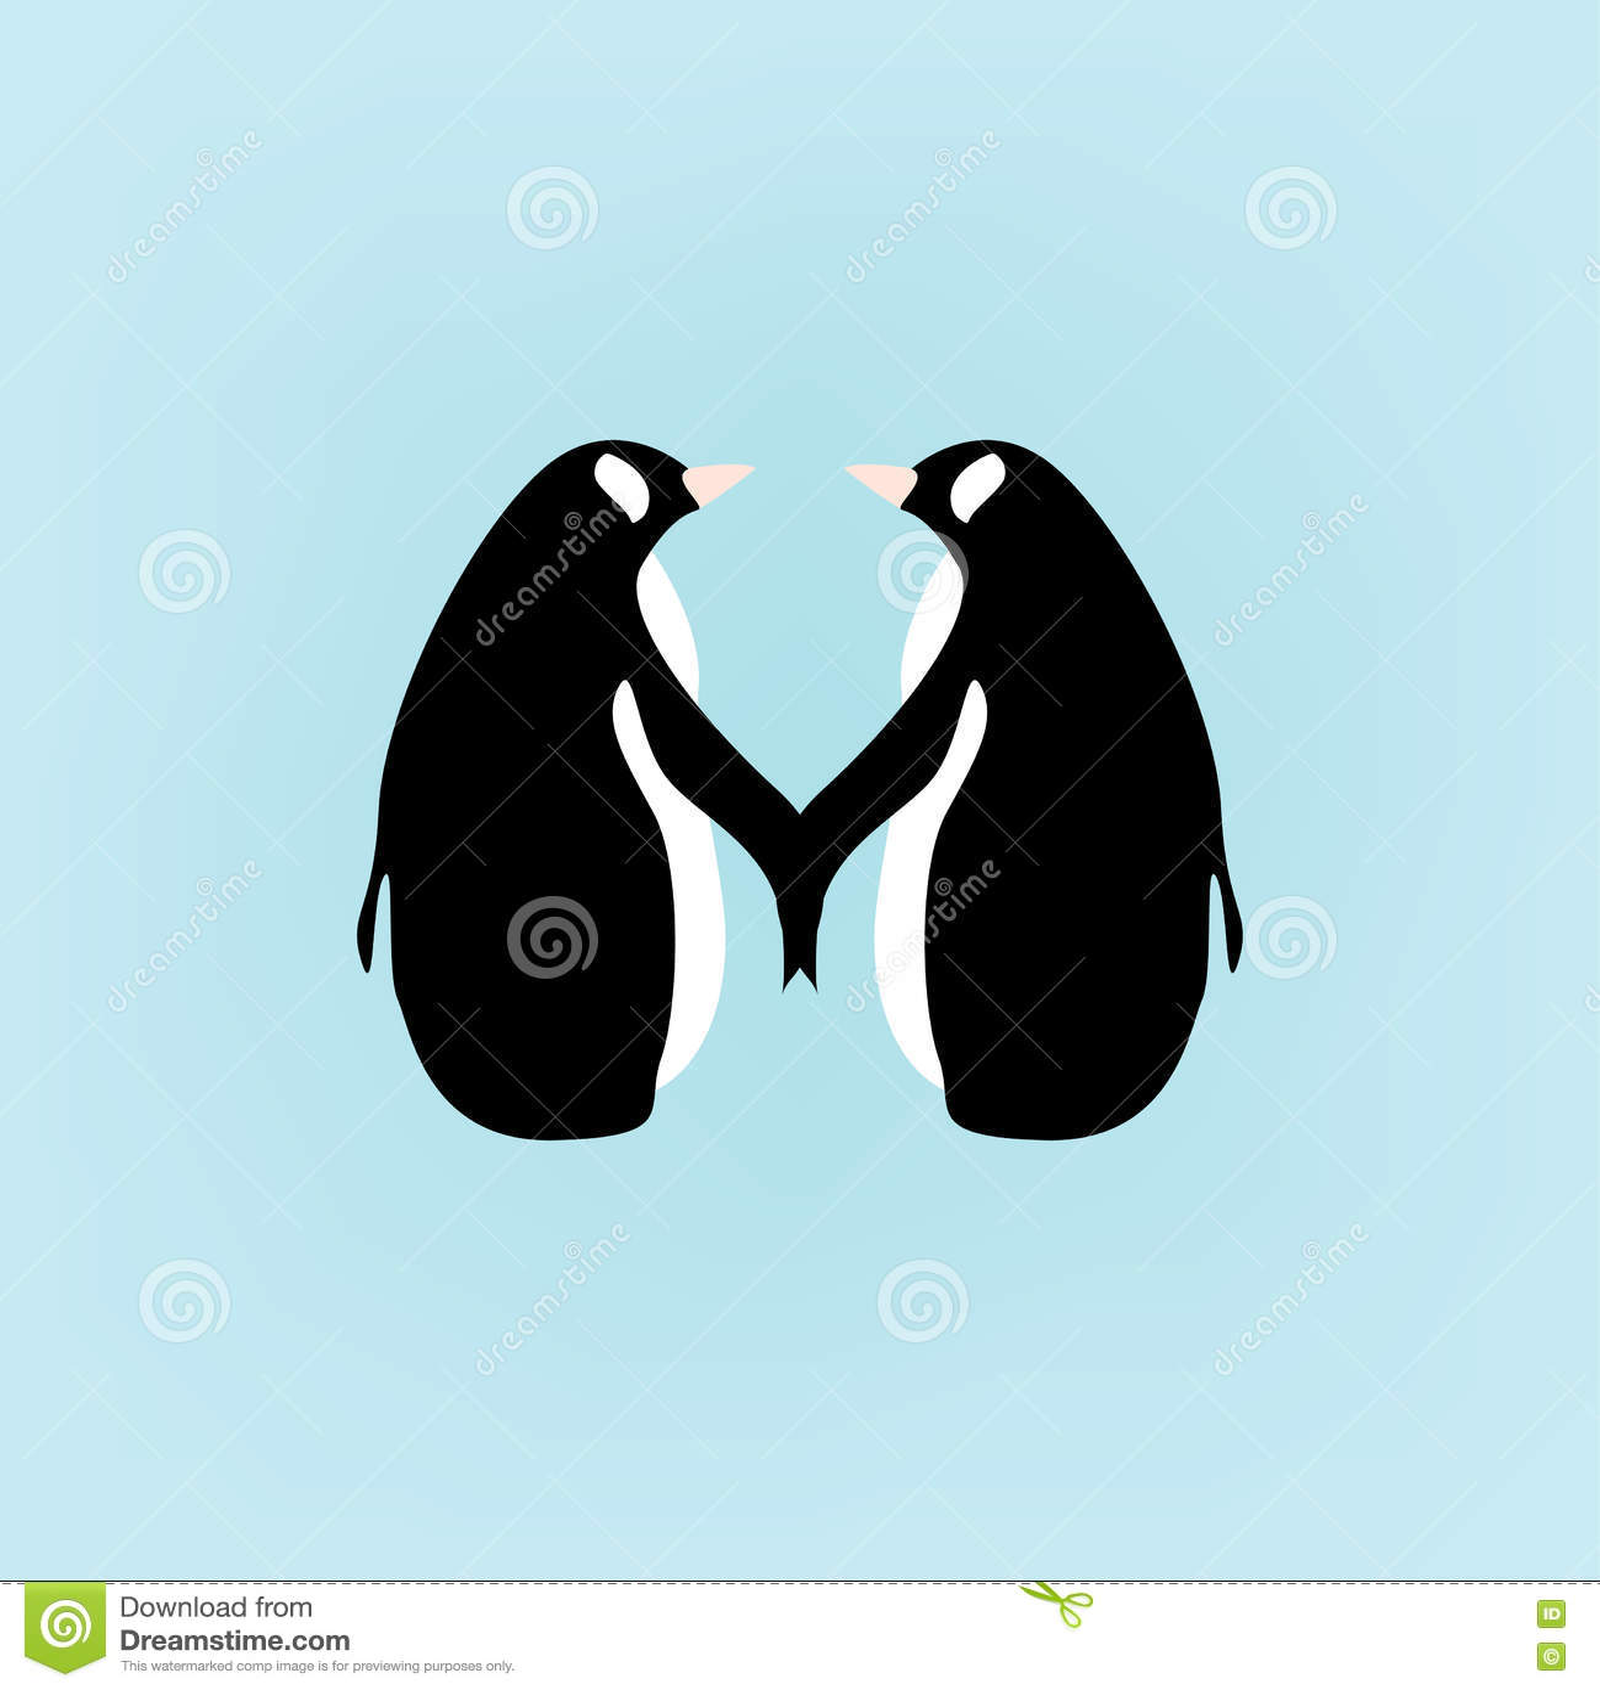 Cartoon penguins holding hands - photo#1